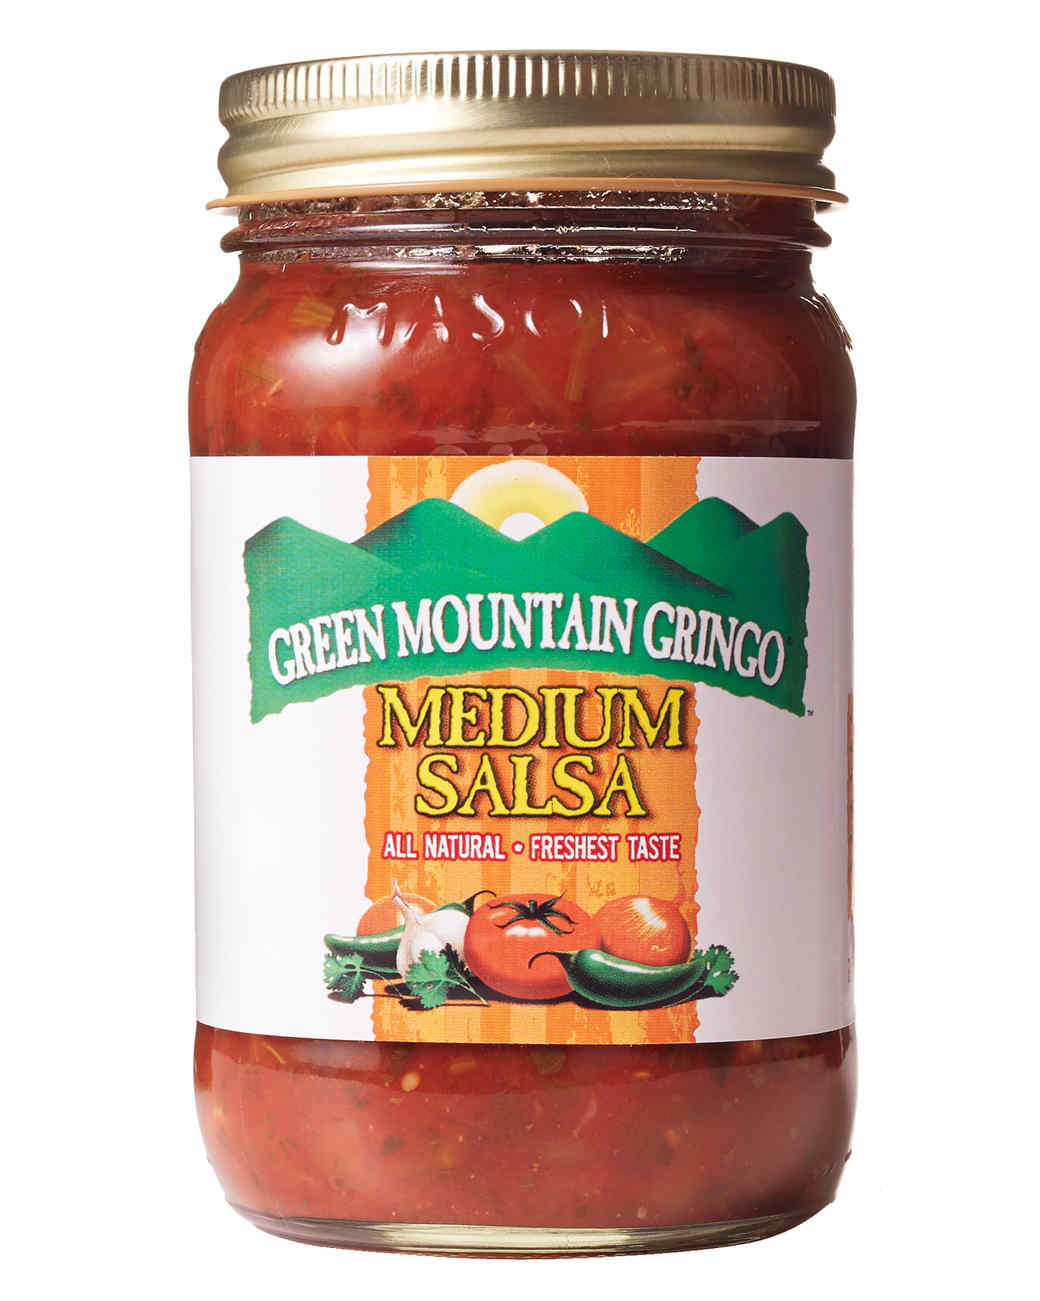 green-mountain-gringo-salsa-029-d112221.jpg